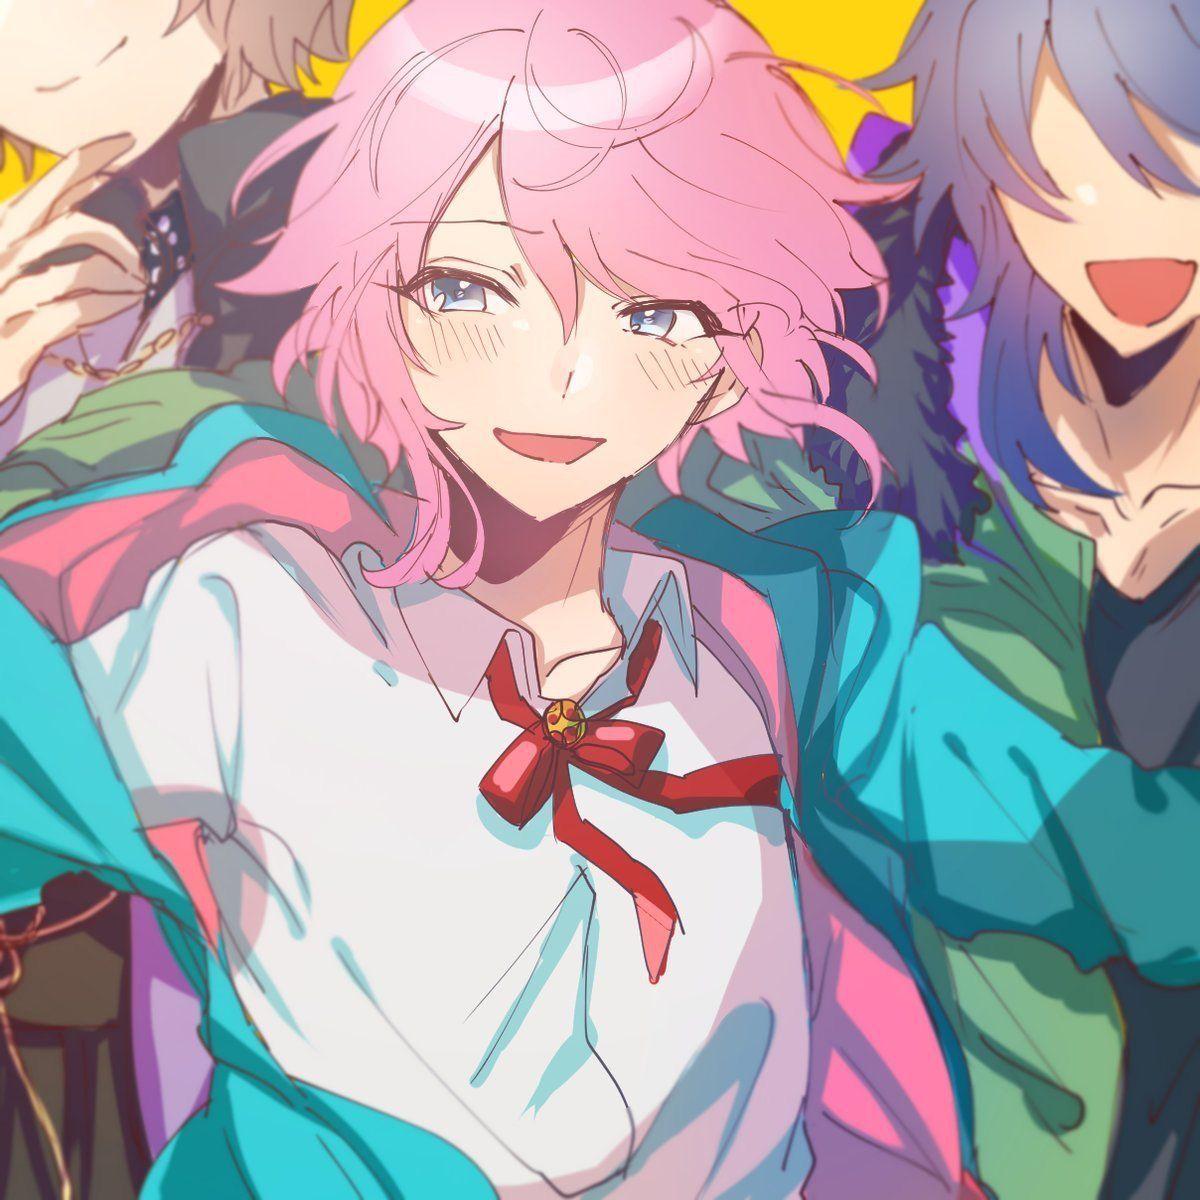 Pin by Brigitte tan on 『ヒプノシスマイク』 Anime guys, Cute anime